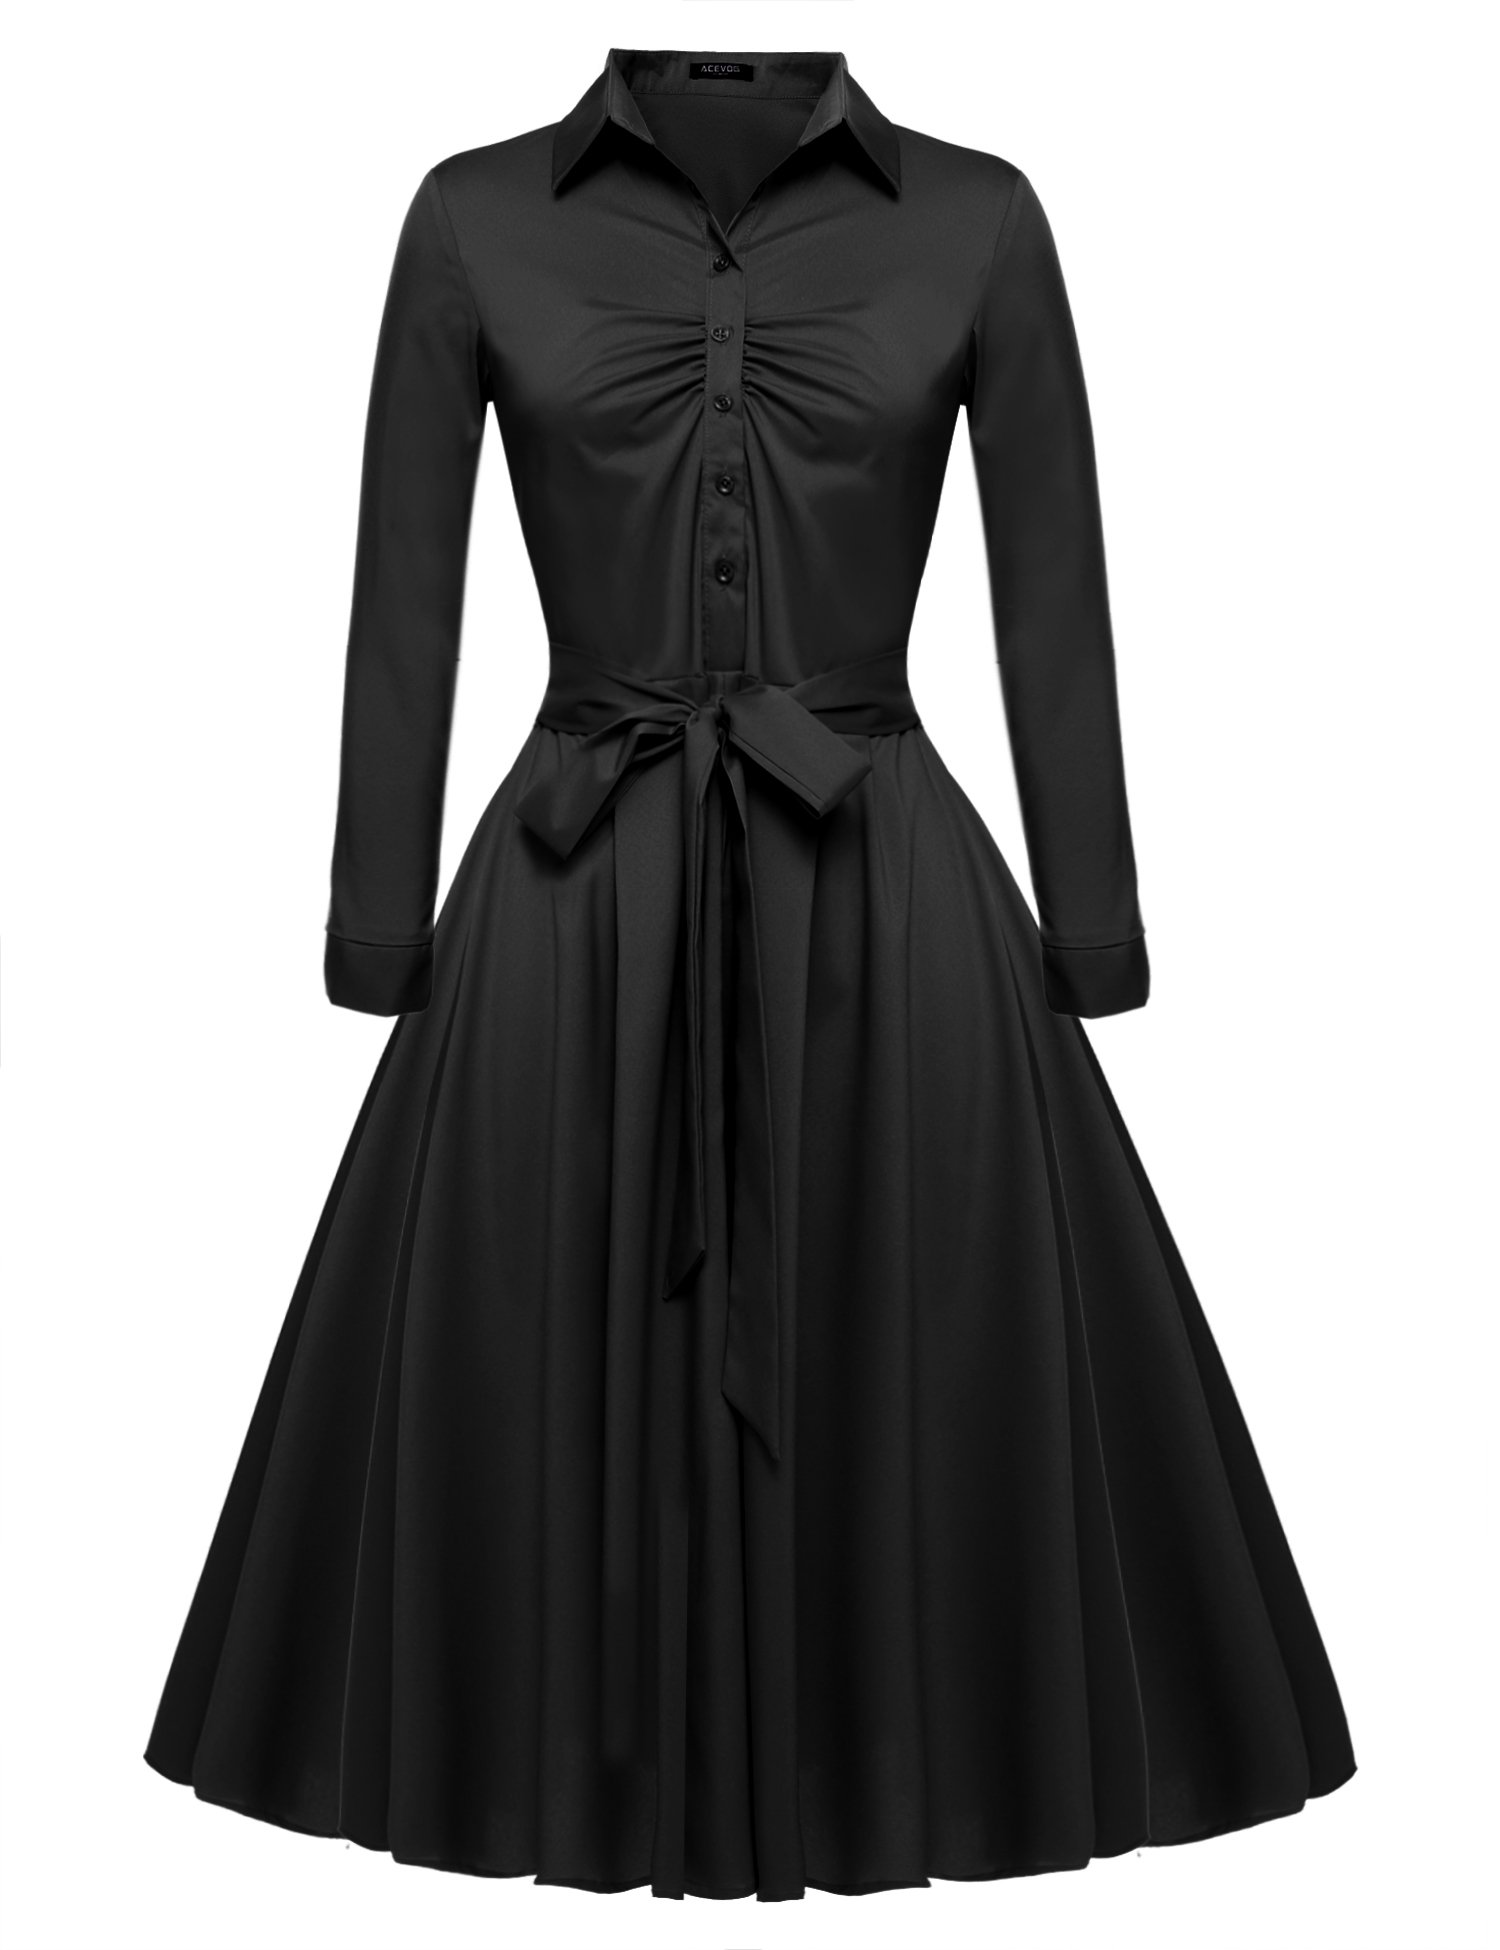 Beyove Women's Vintage Retro Soild A-line Cocktail Party Dress Black XL